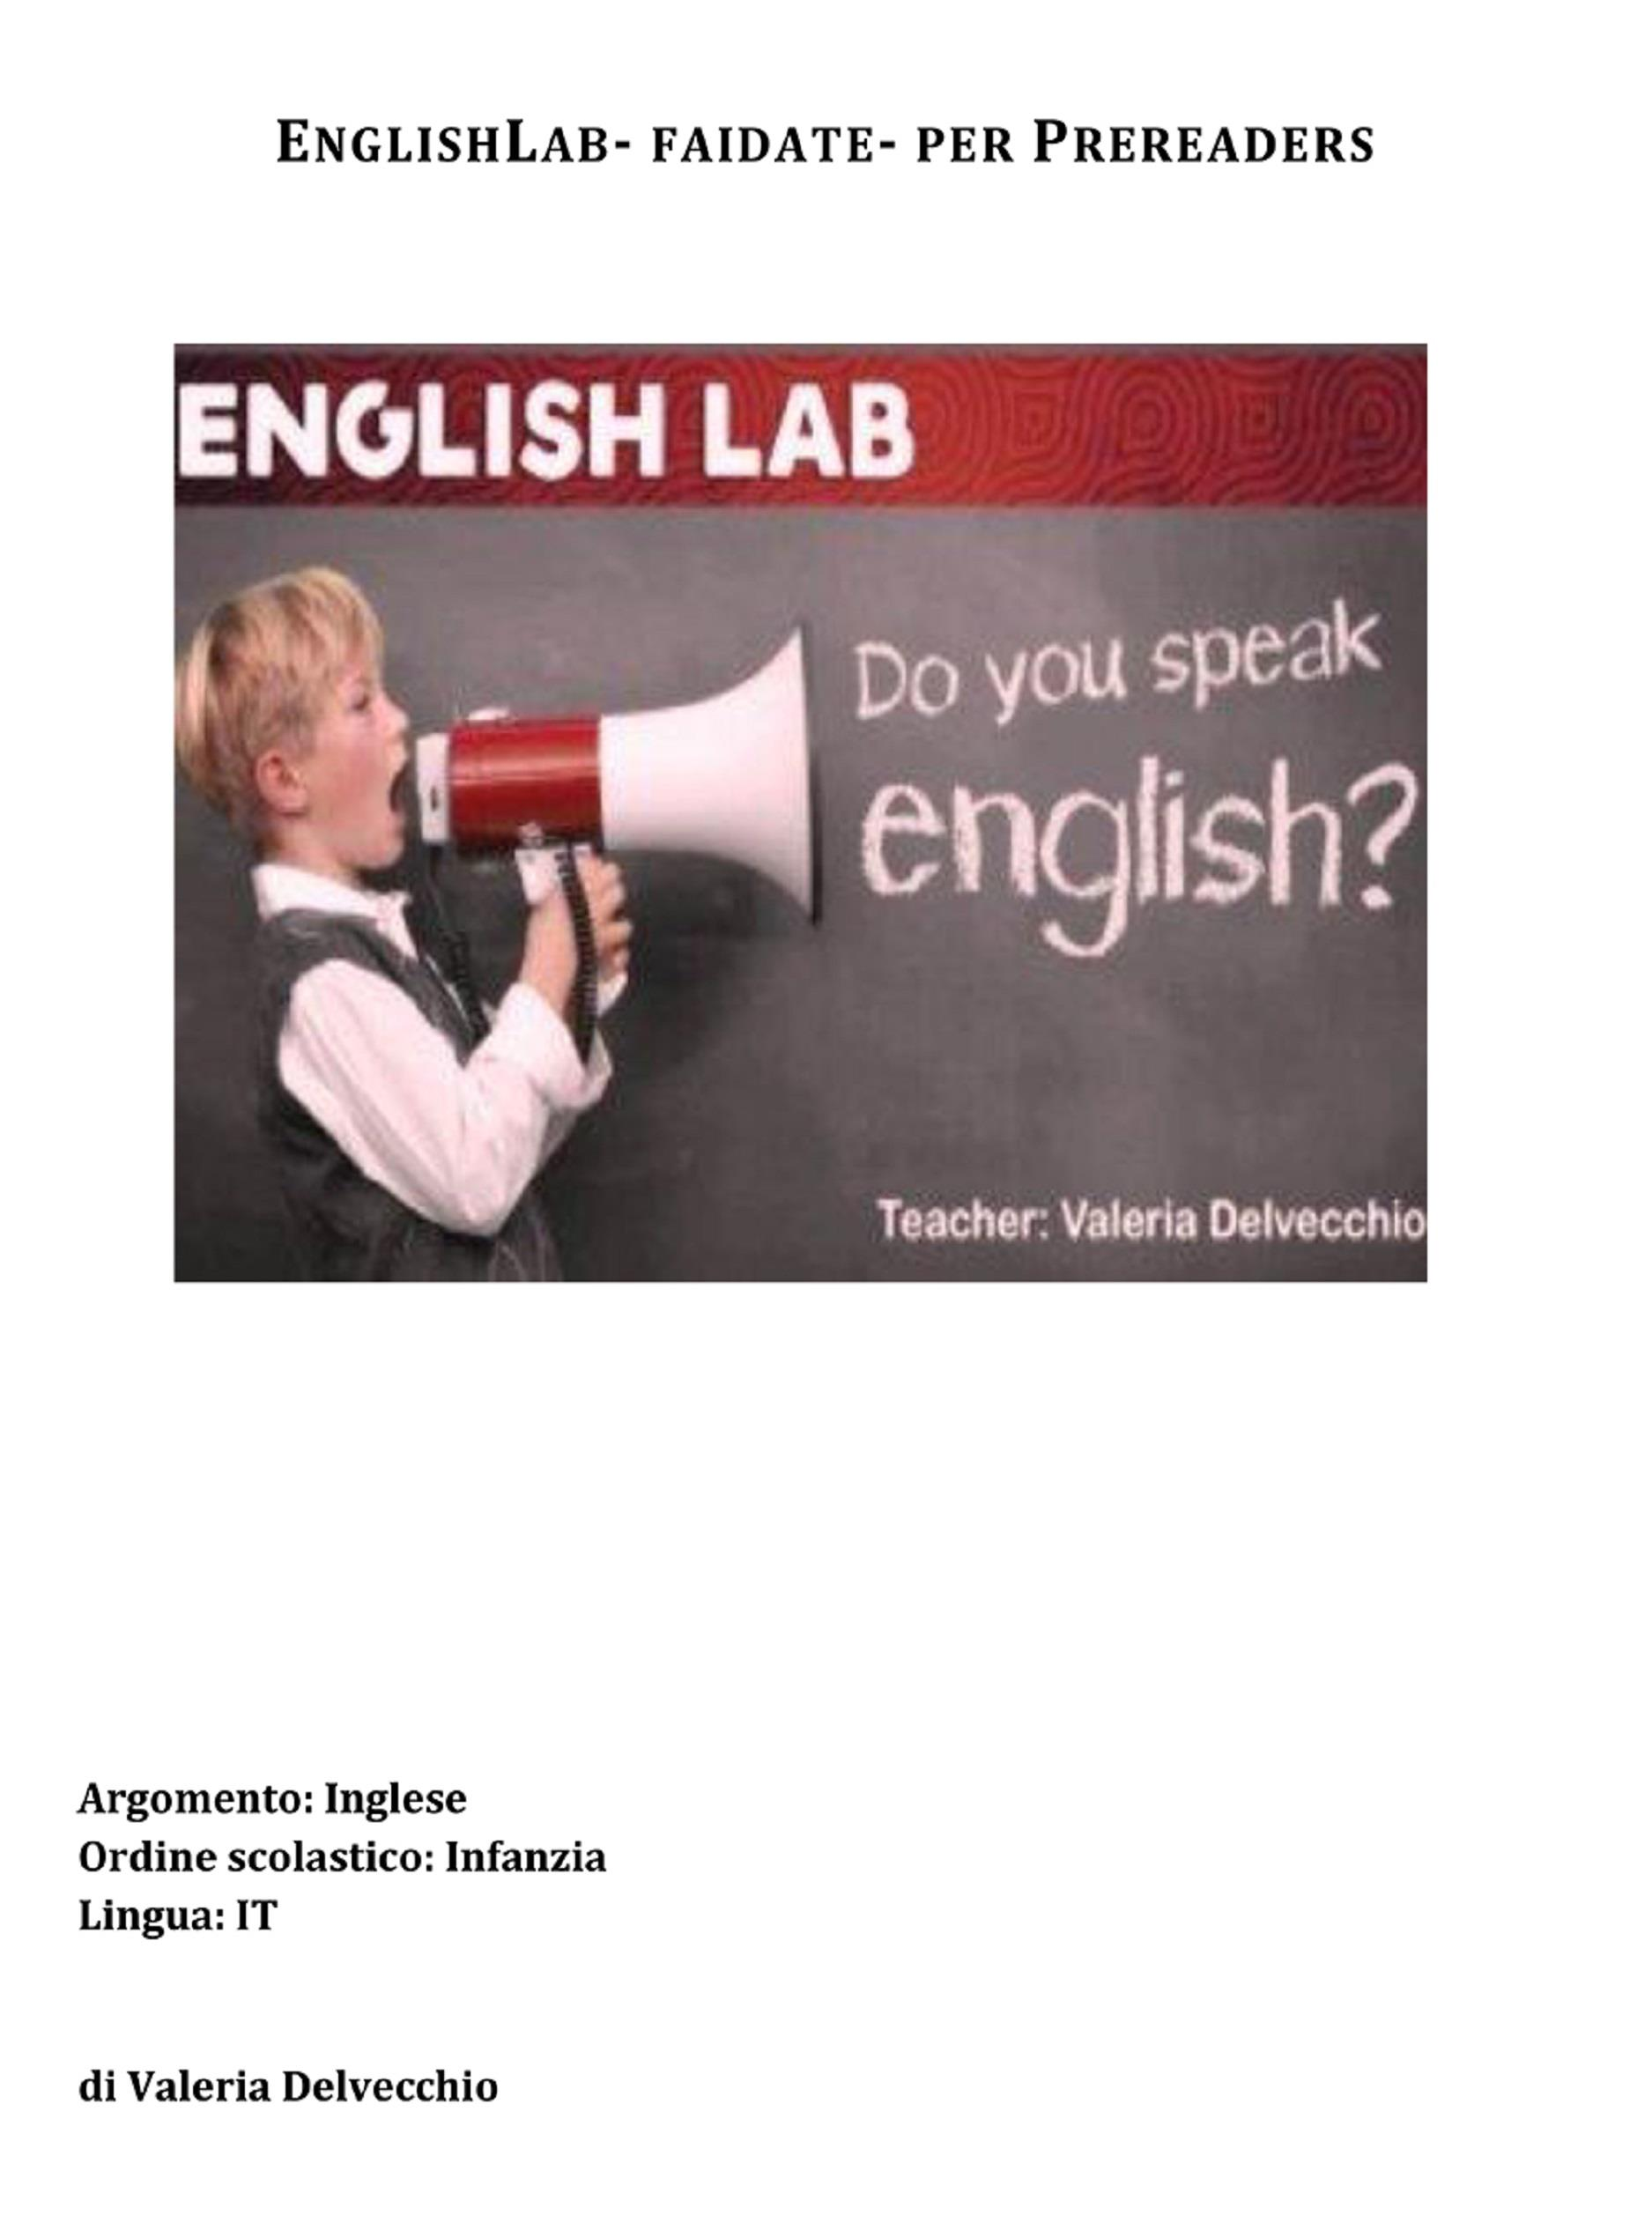 Englishlab-fai da te- per Prereaders